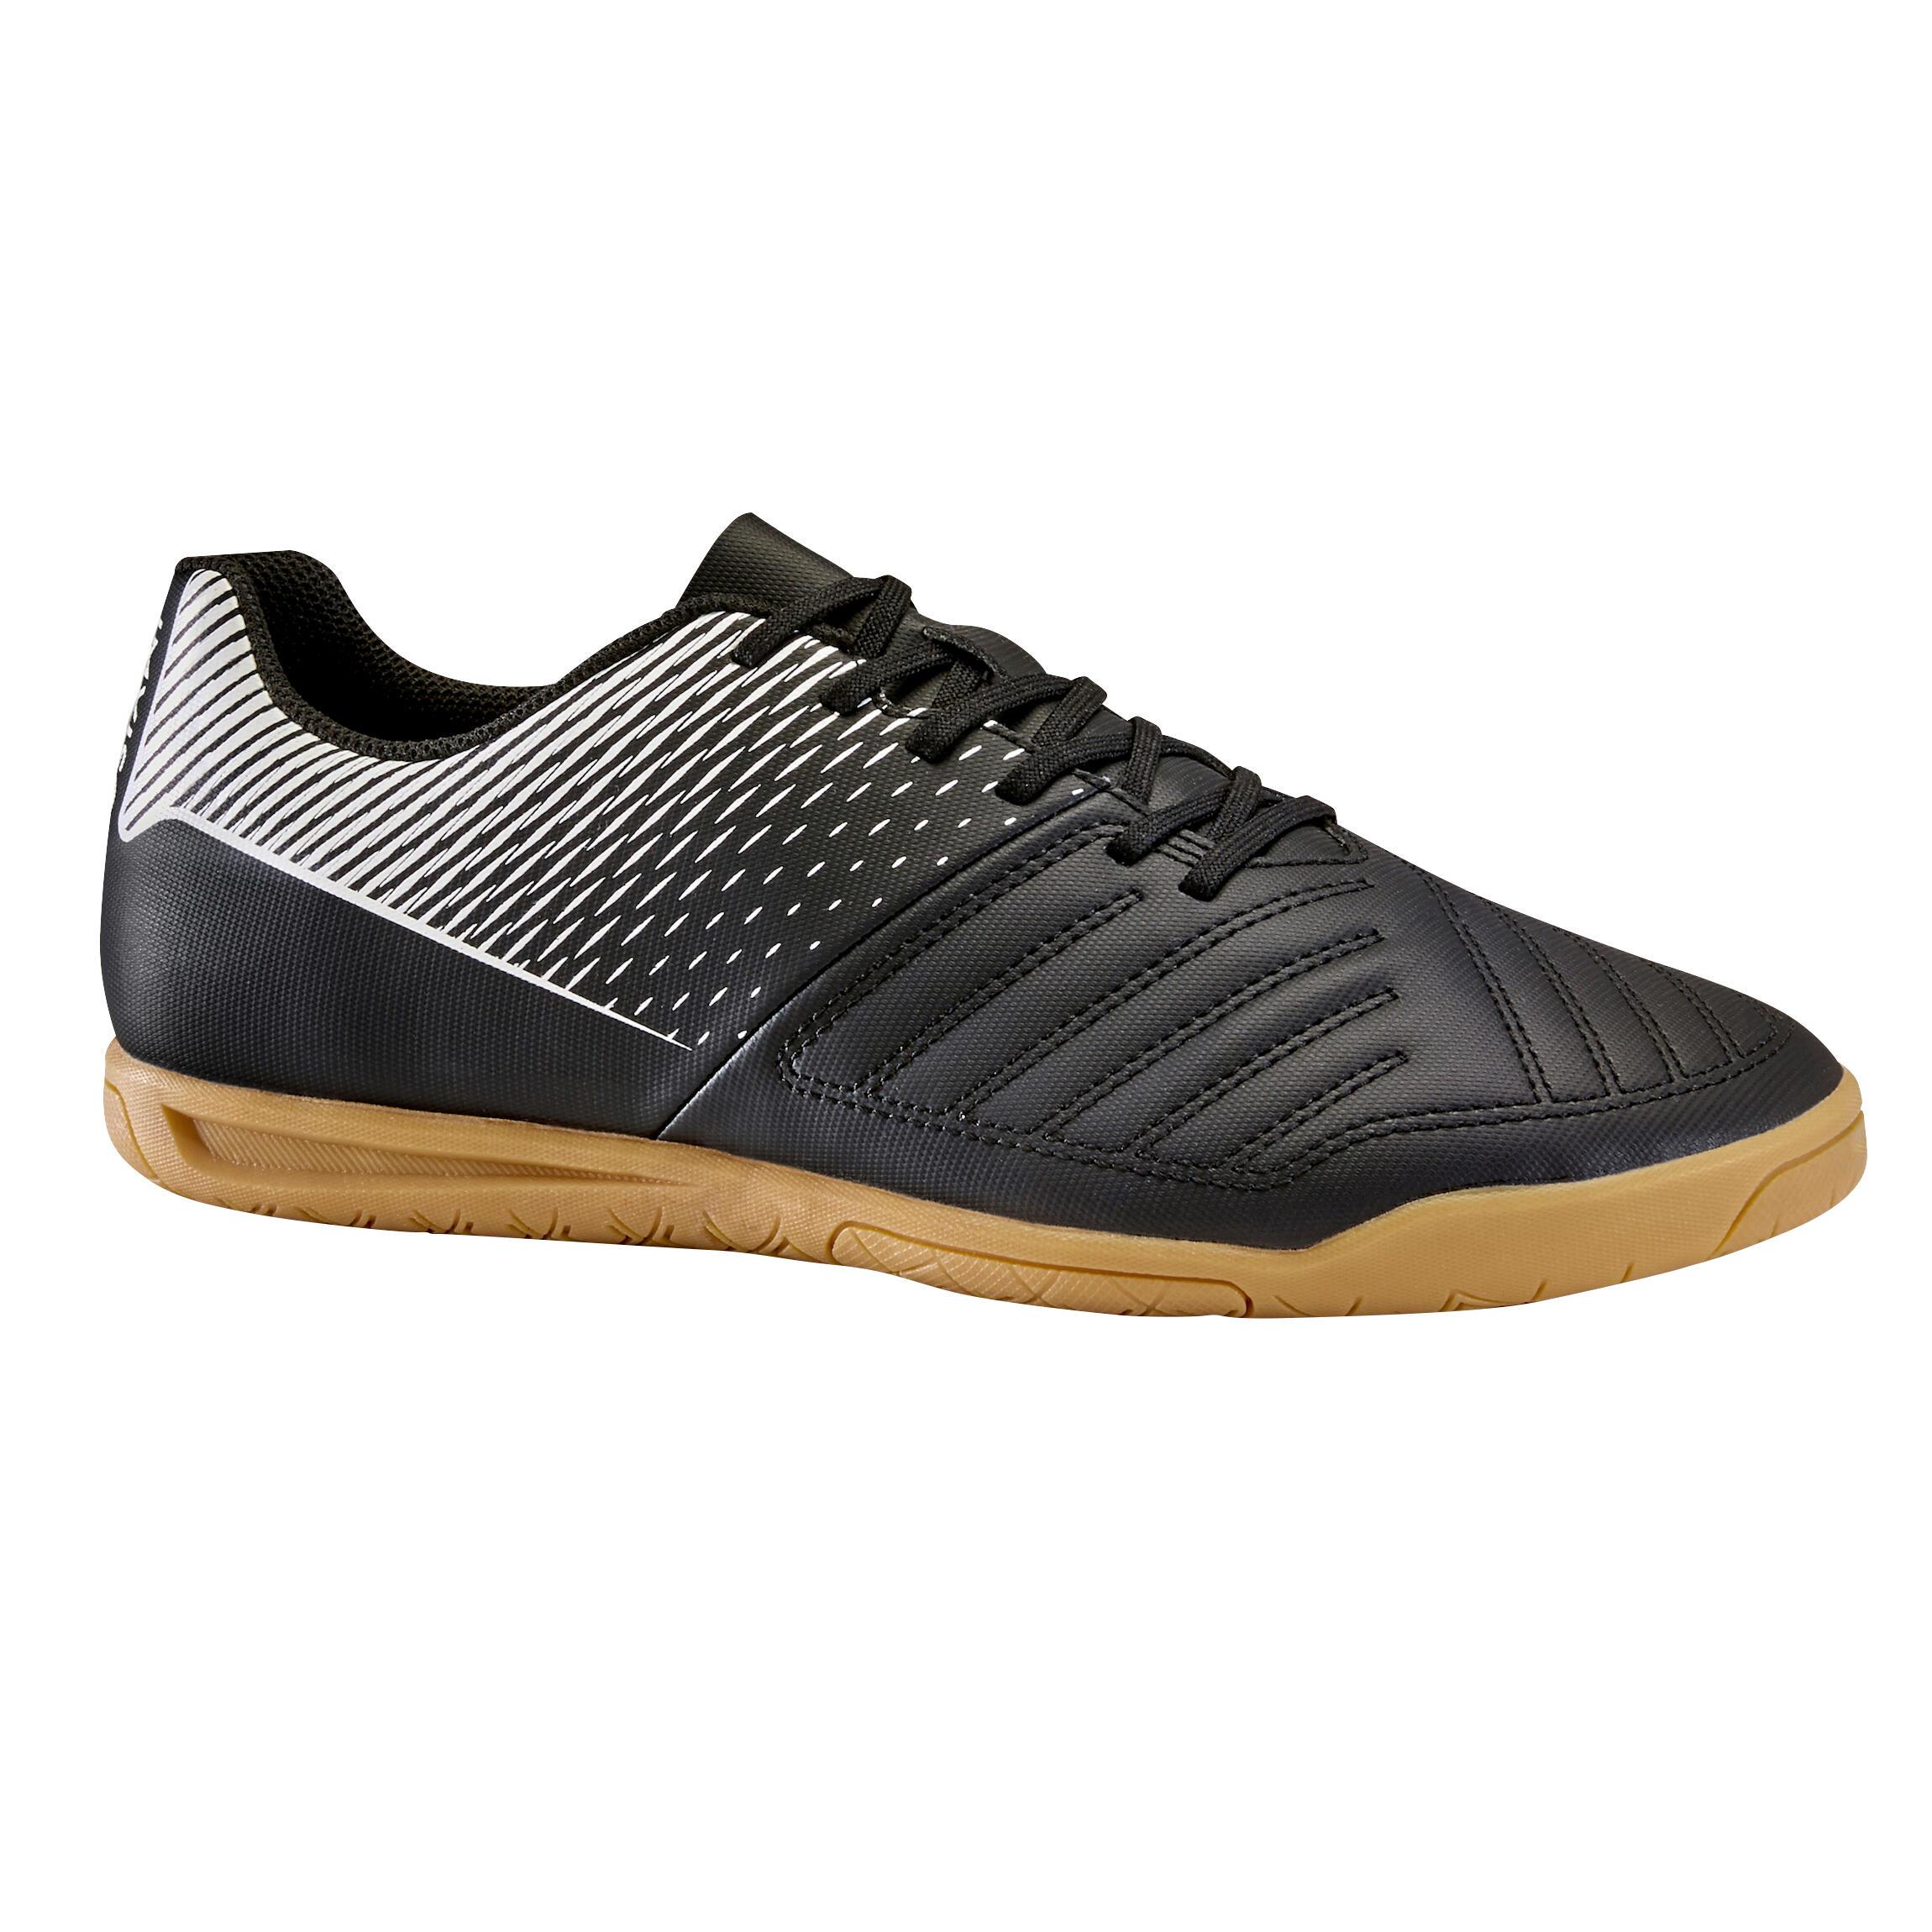 Hallenschuhe Futsal 100 Erwachsene | Schuhe > Sportschuhe > Hallenschuhe | Imviso